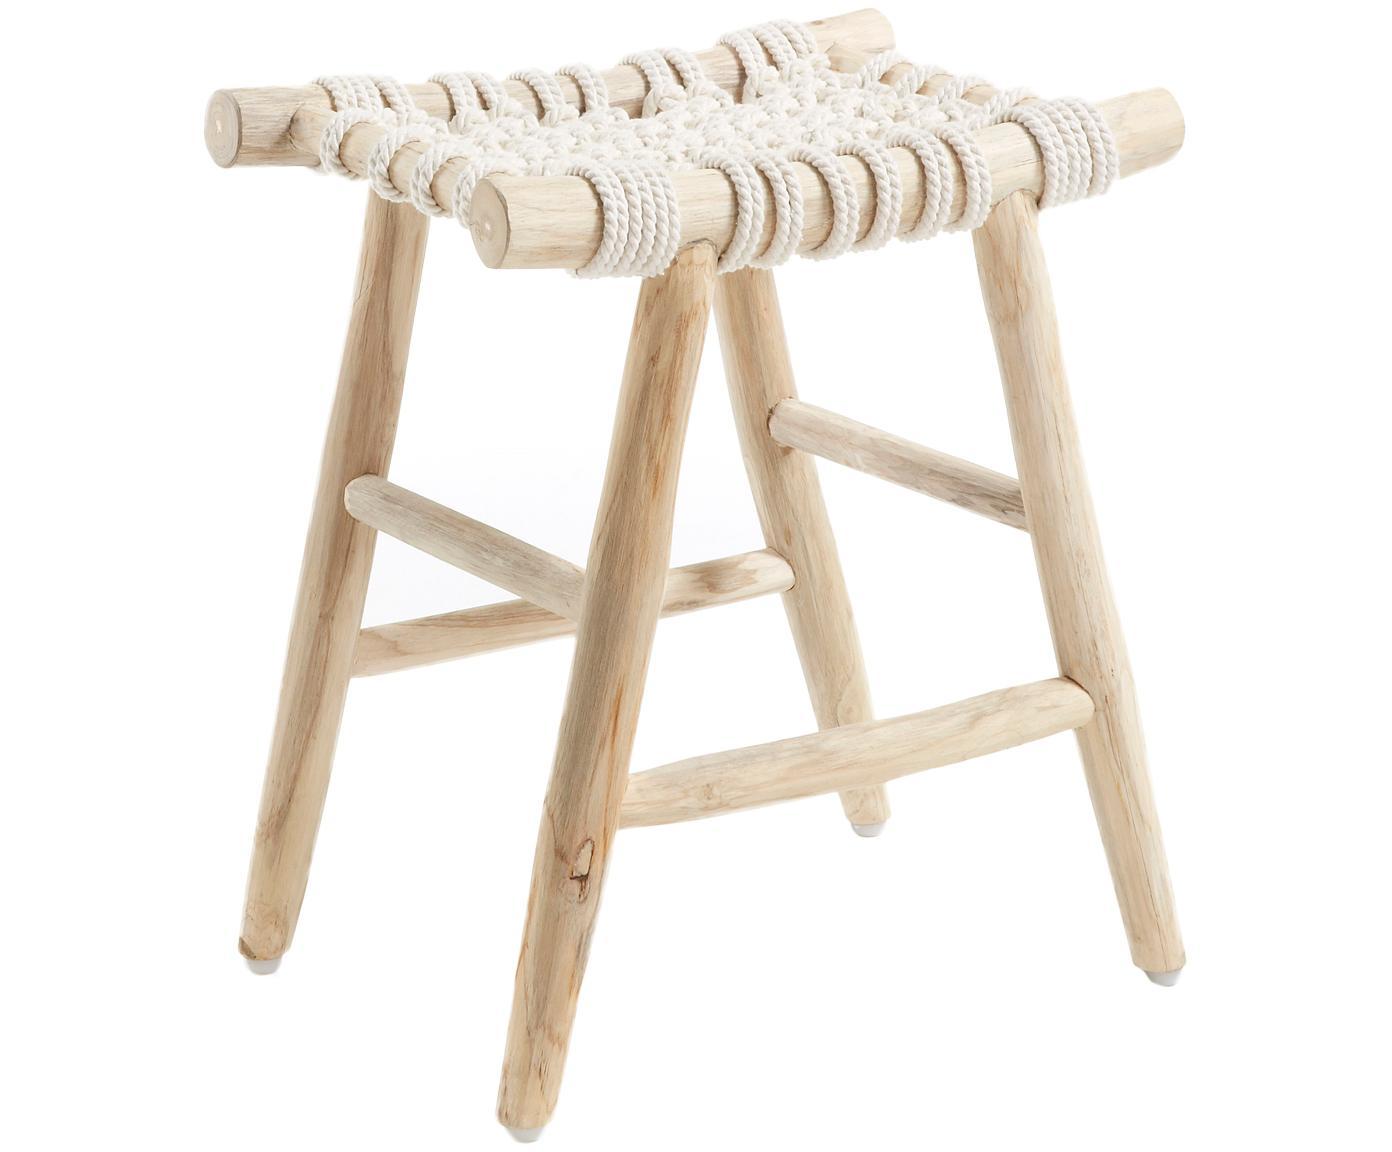 Hocker Edgard im Boho Style, Beine: Teakholz, naturbelassen, Sitzfläche: Baumwollseilgurt, Teakholz, Weiss, 45 x 45 cm